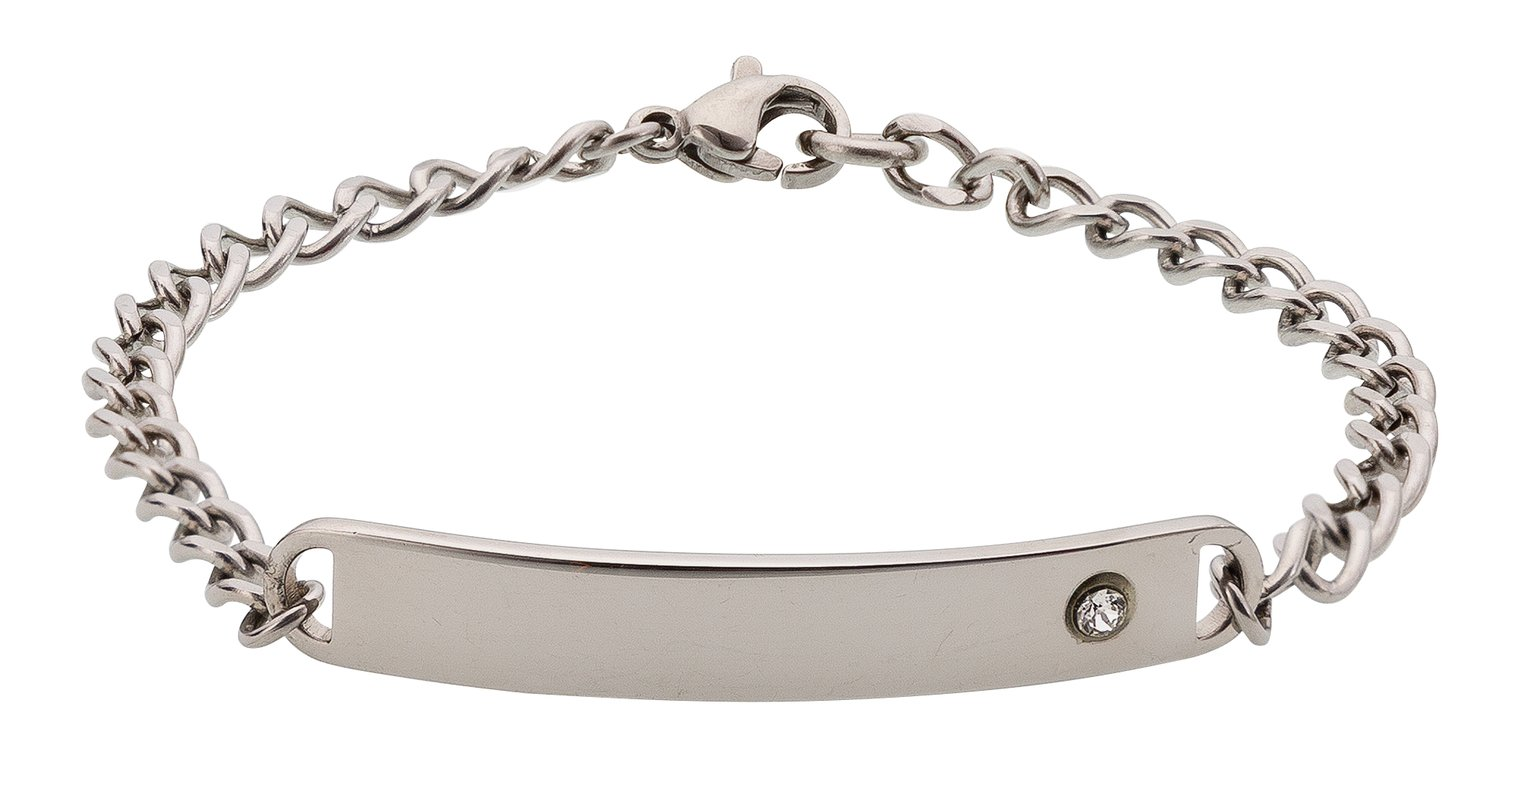 Revere Kid's Stainless Steel ID Bracelet